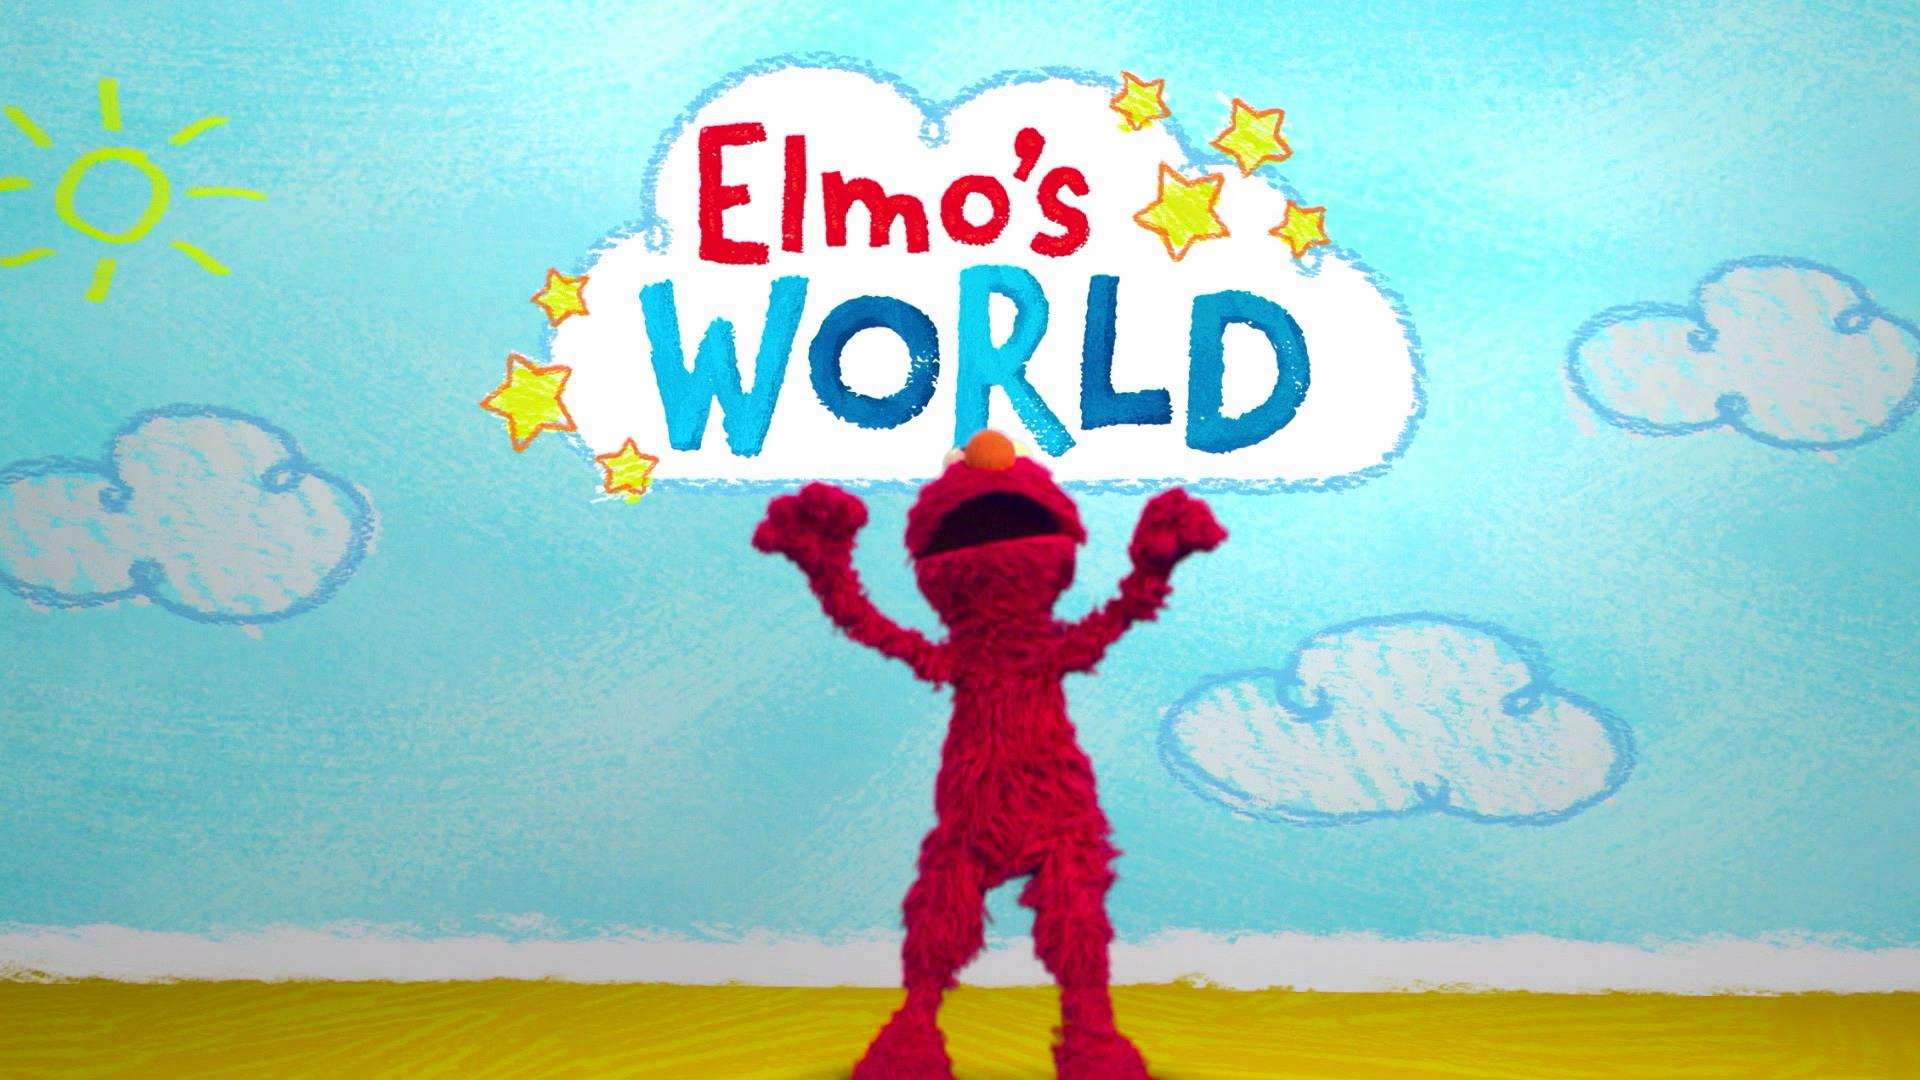 Elmo S World Get A Sneak Peek At The New Season On